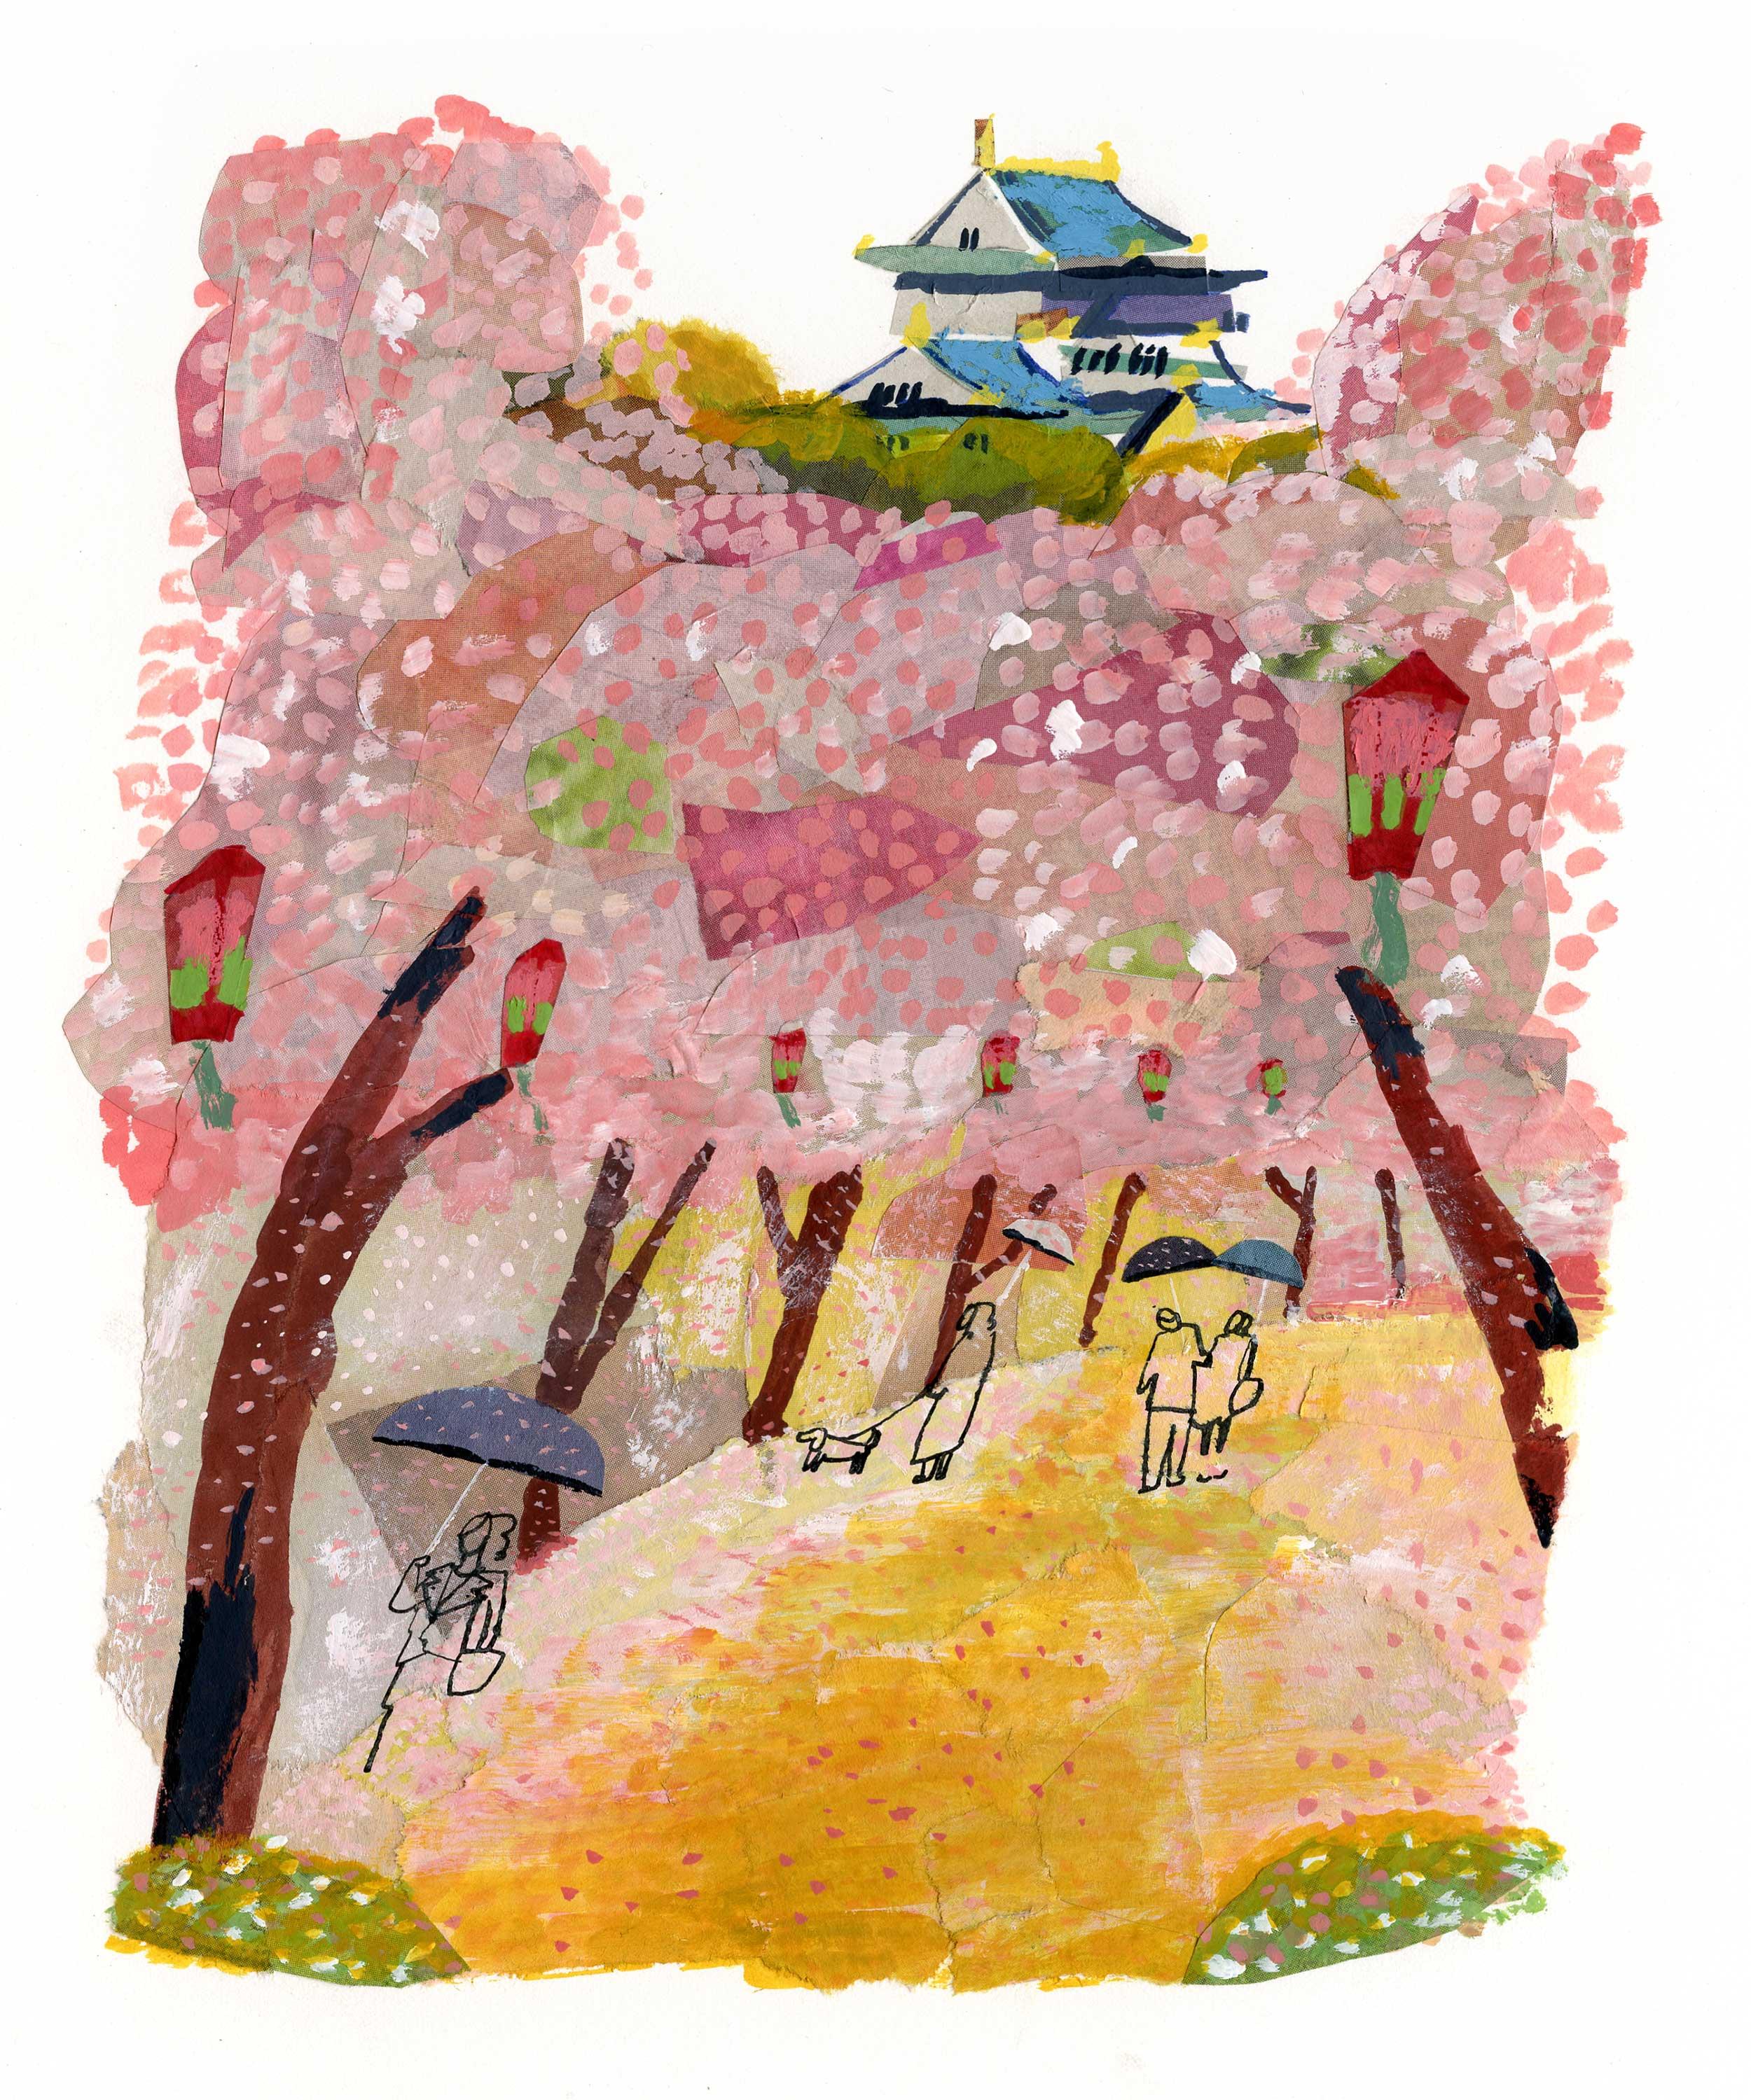 St Regis Beyond illustrations by James Oses, image 9